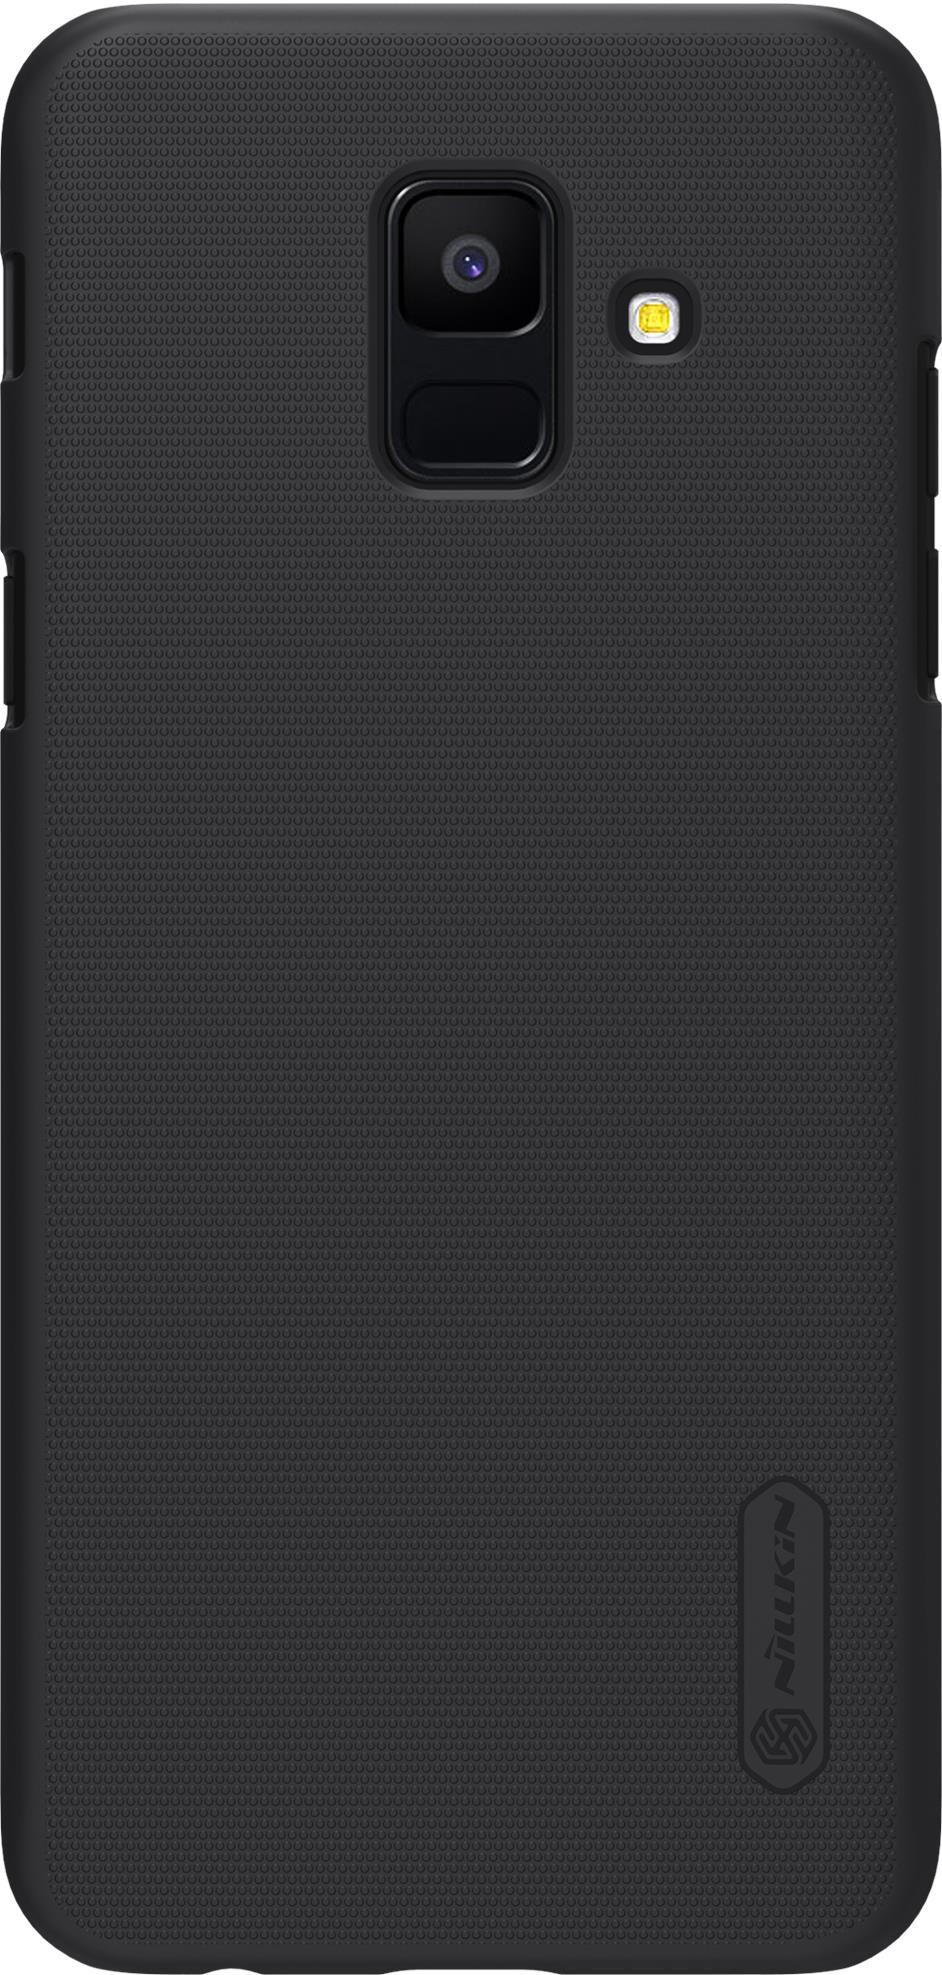 Накладка Nillkin Super Frosted для Galaxy A6, 6902048157798, черный